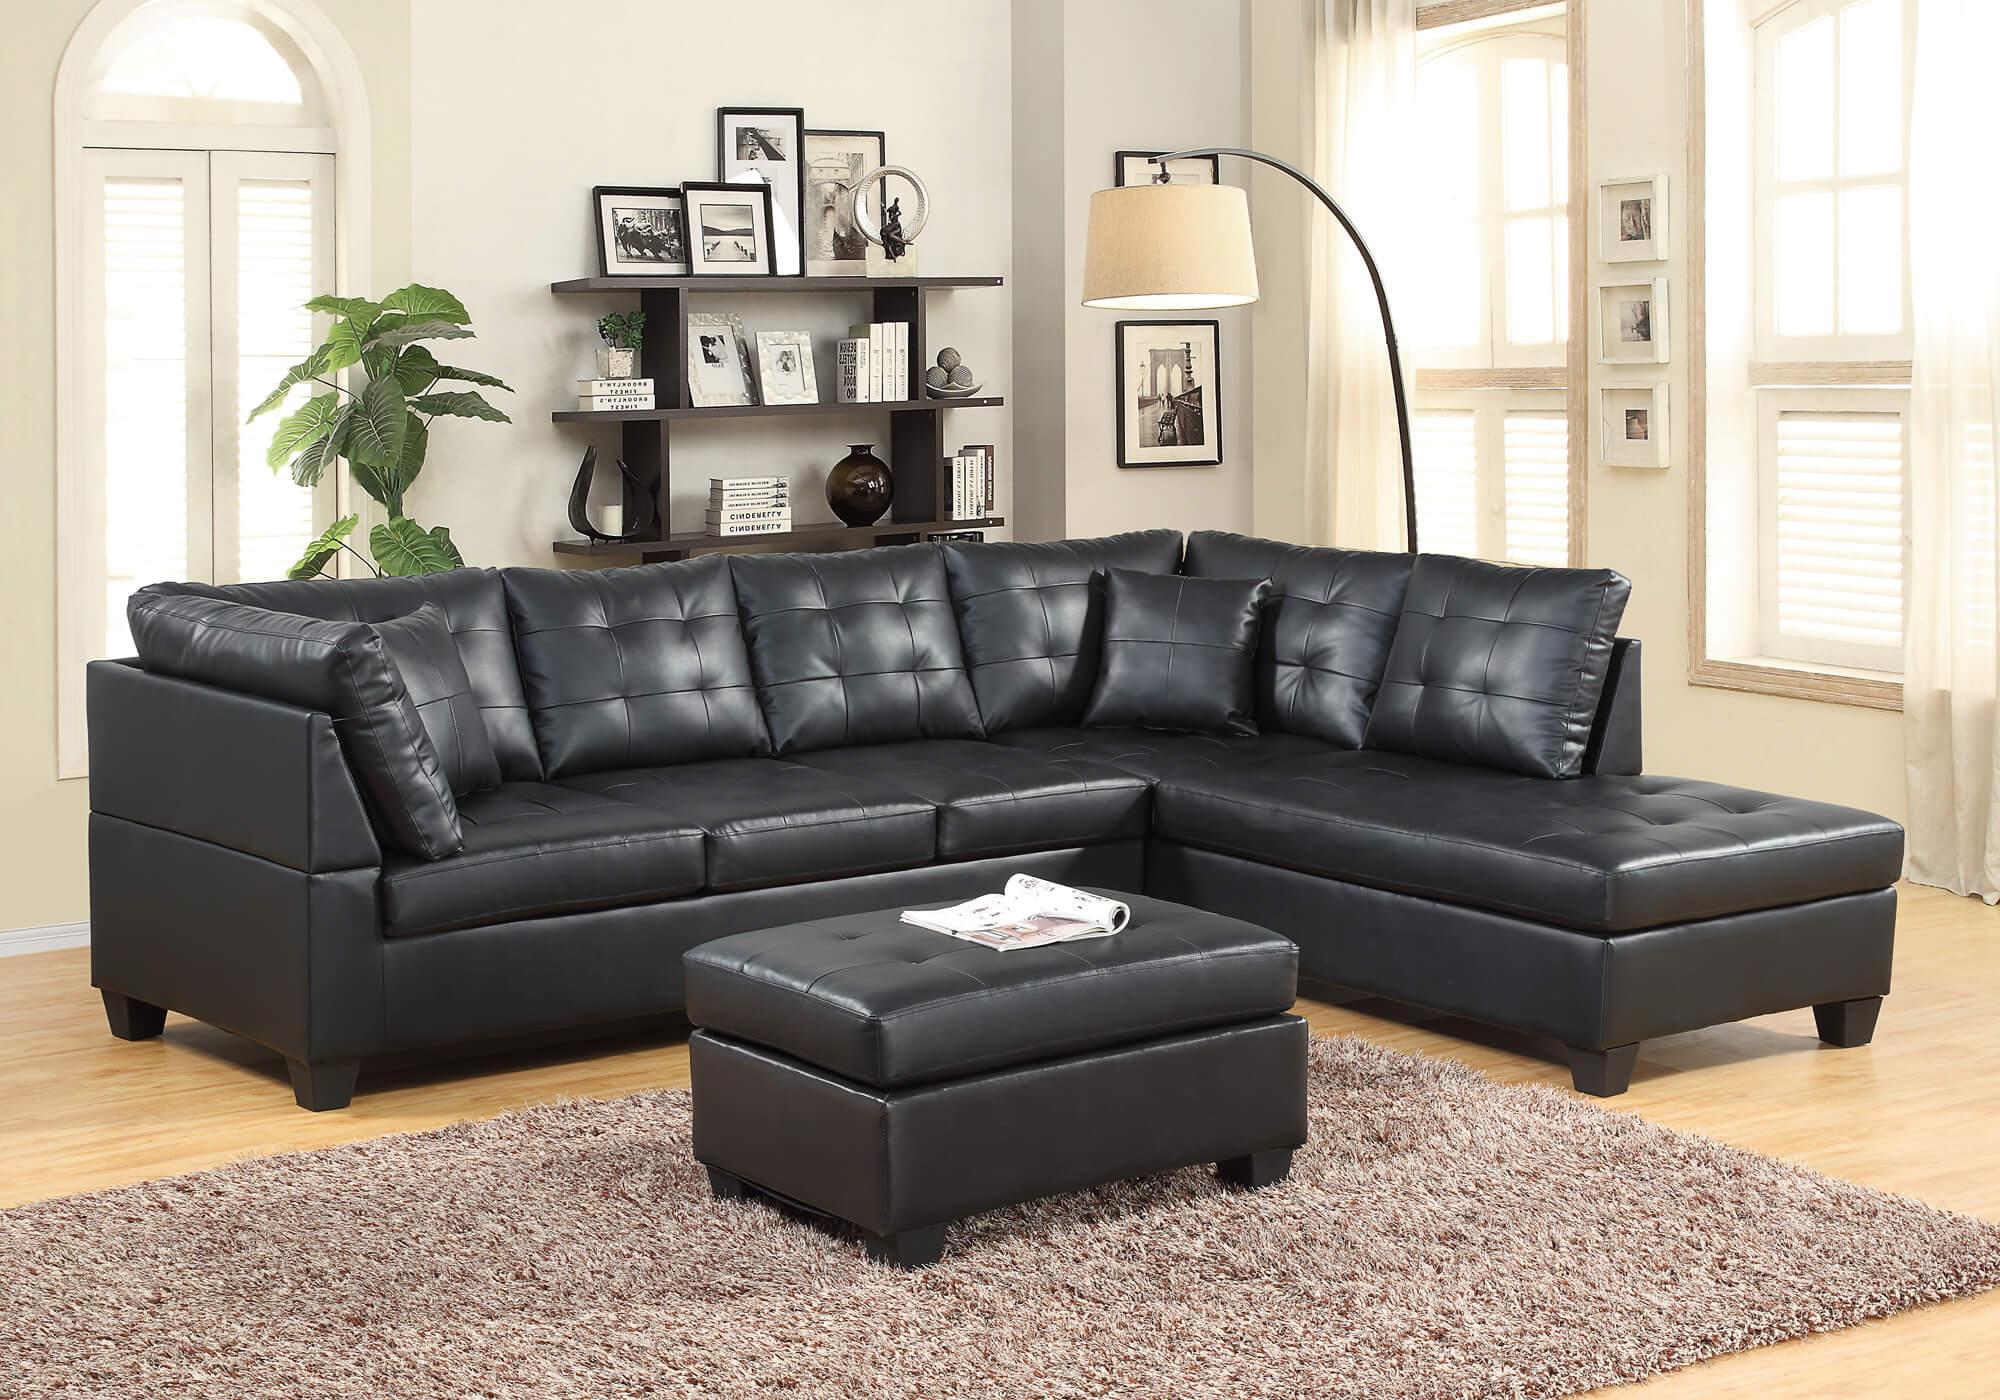 Black Leather Like Sectiona